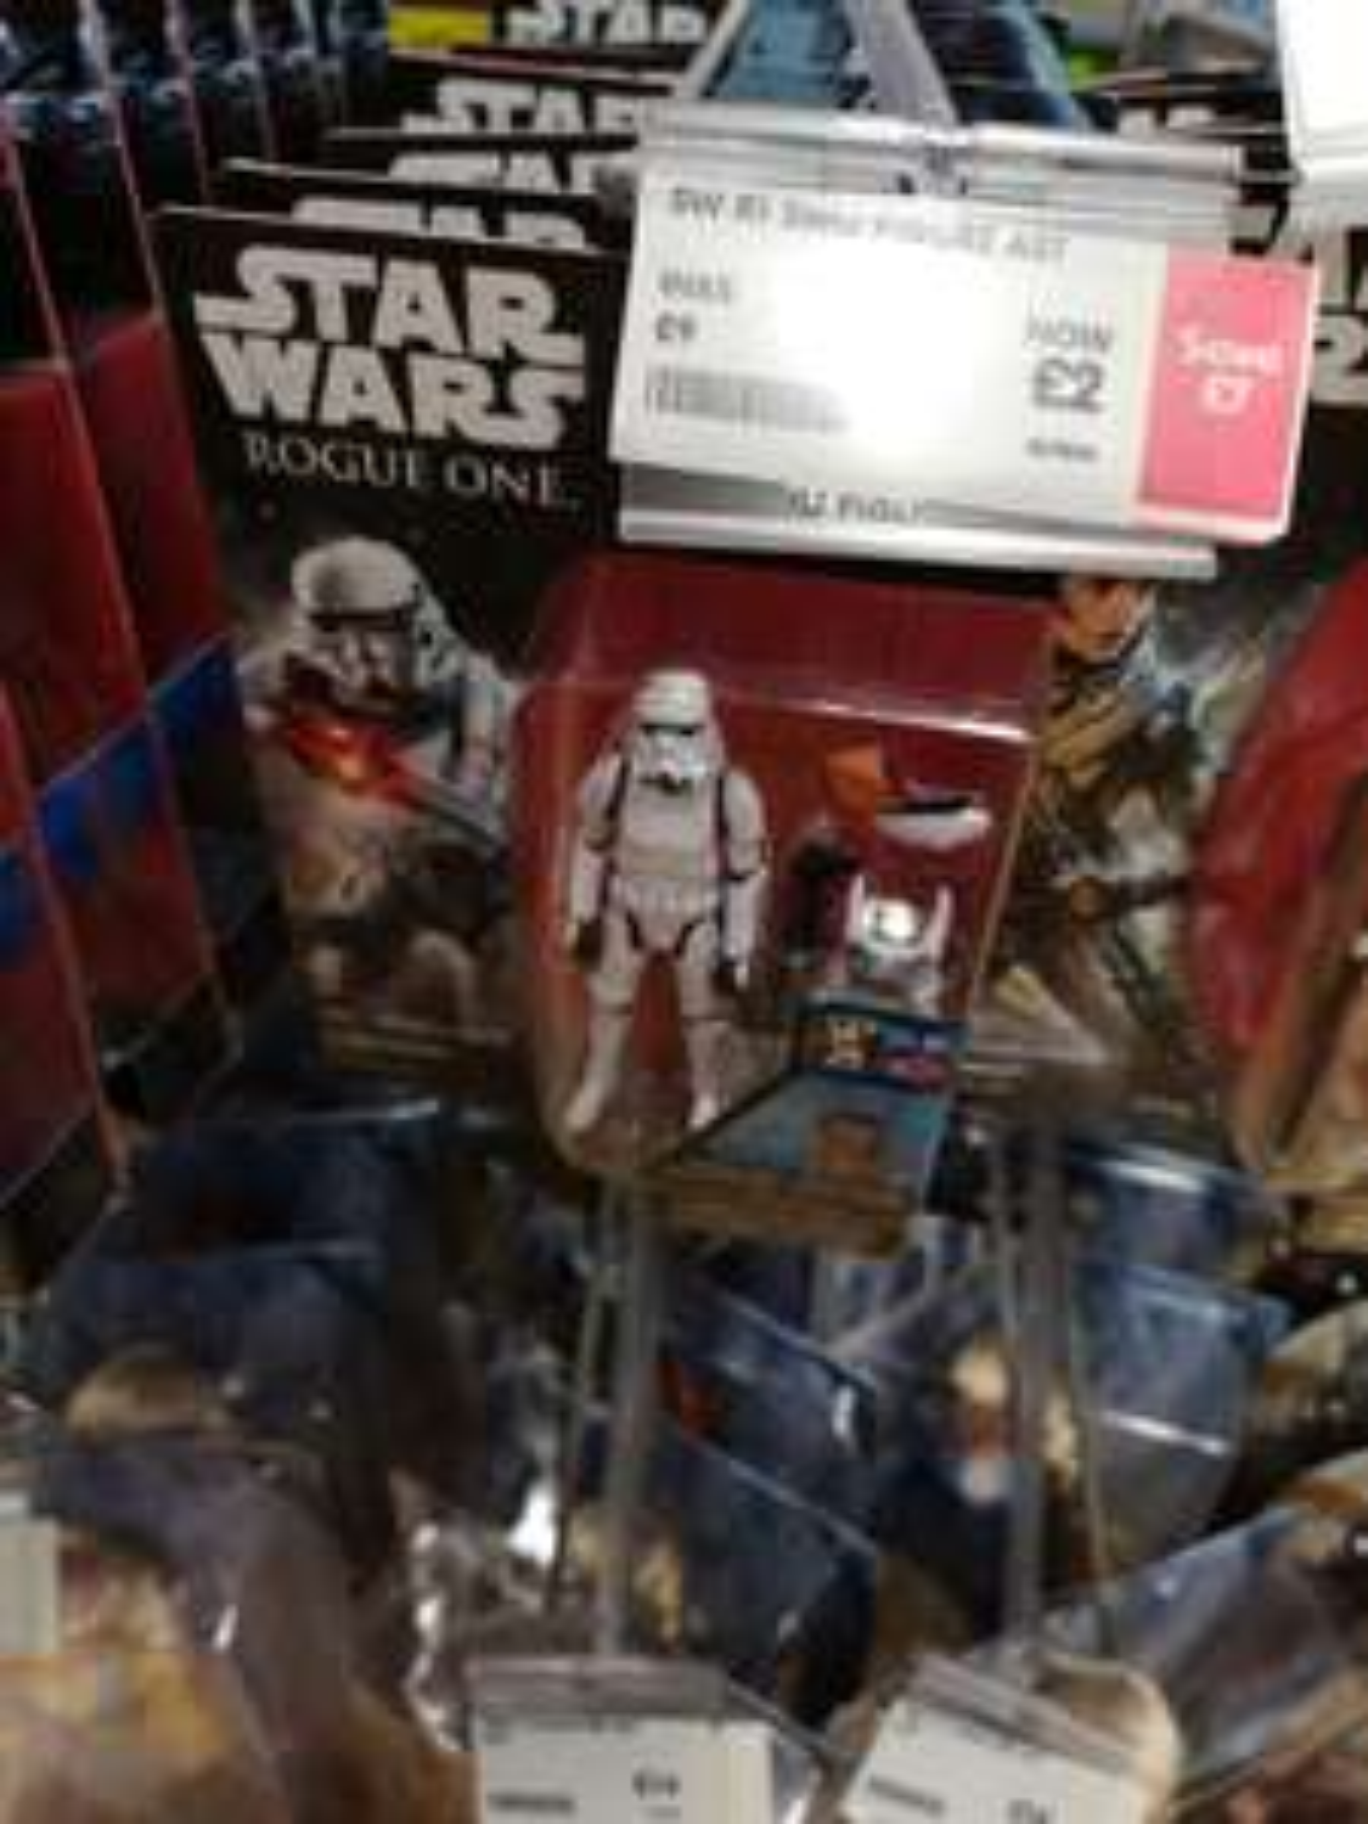 Star Wars Rogue one 3.75 inch figures £2 at Matalan Edinburgh